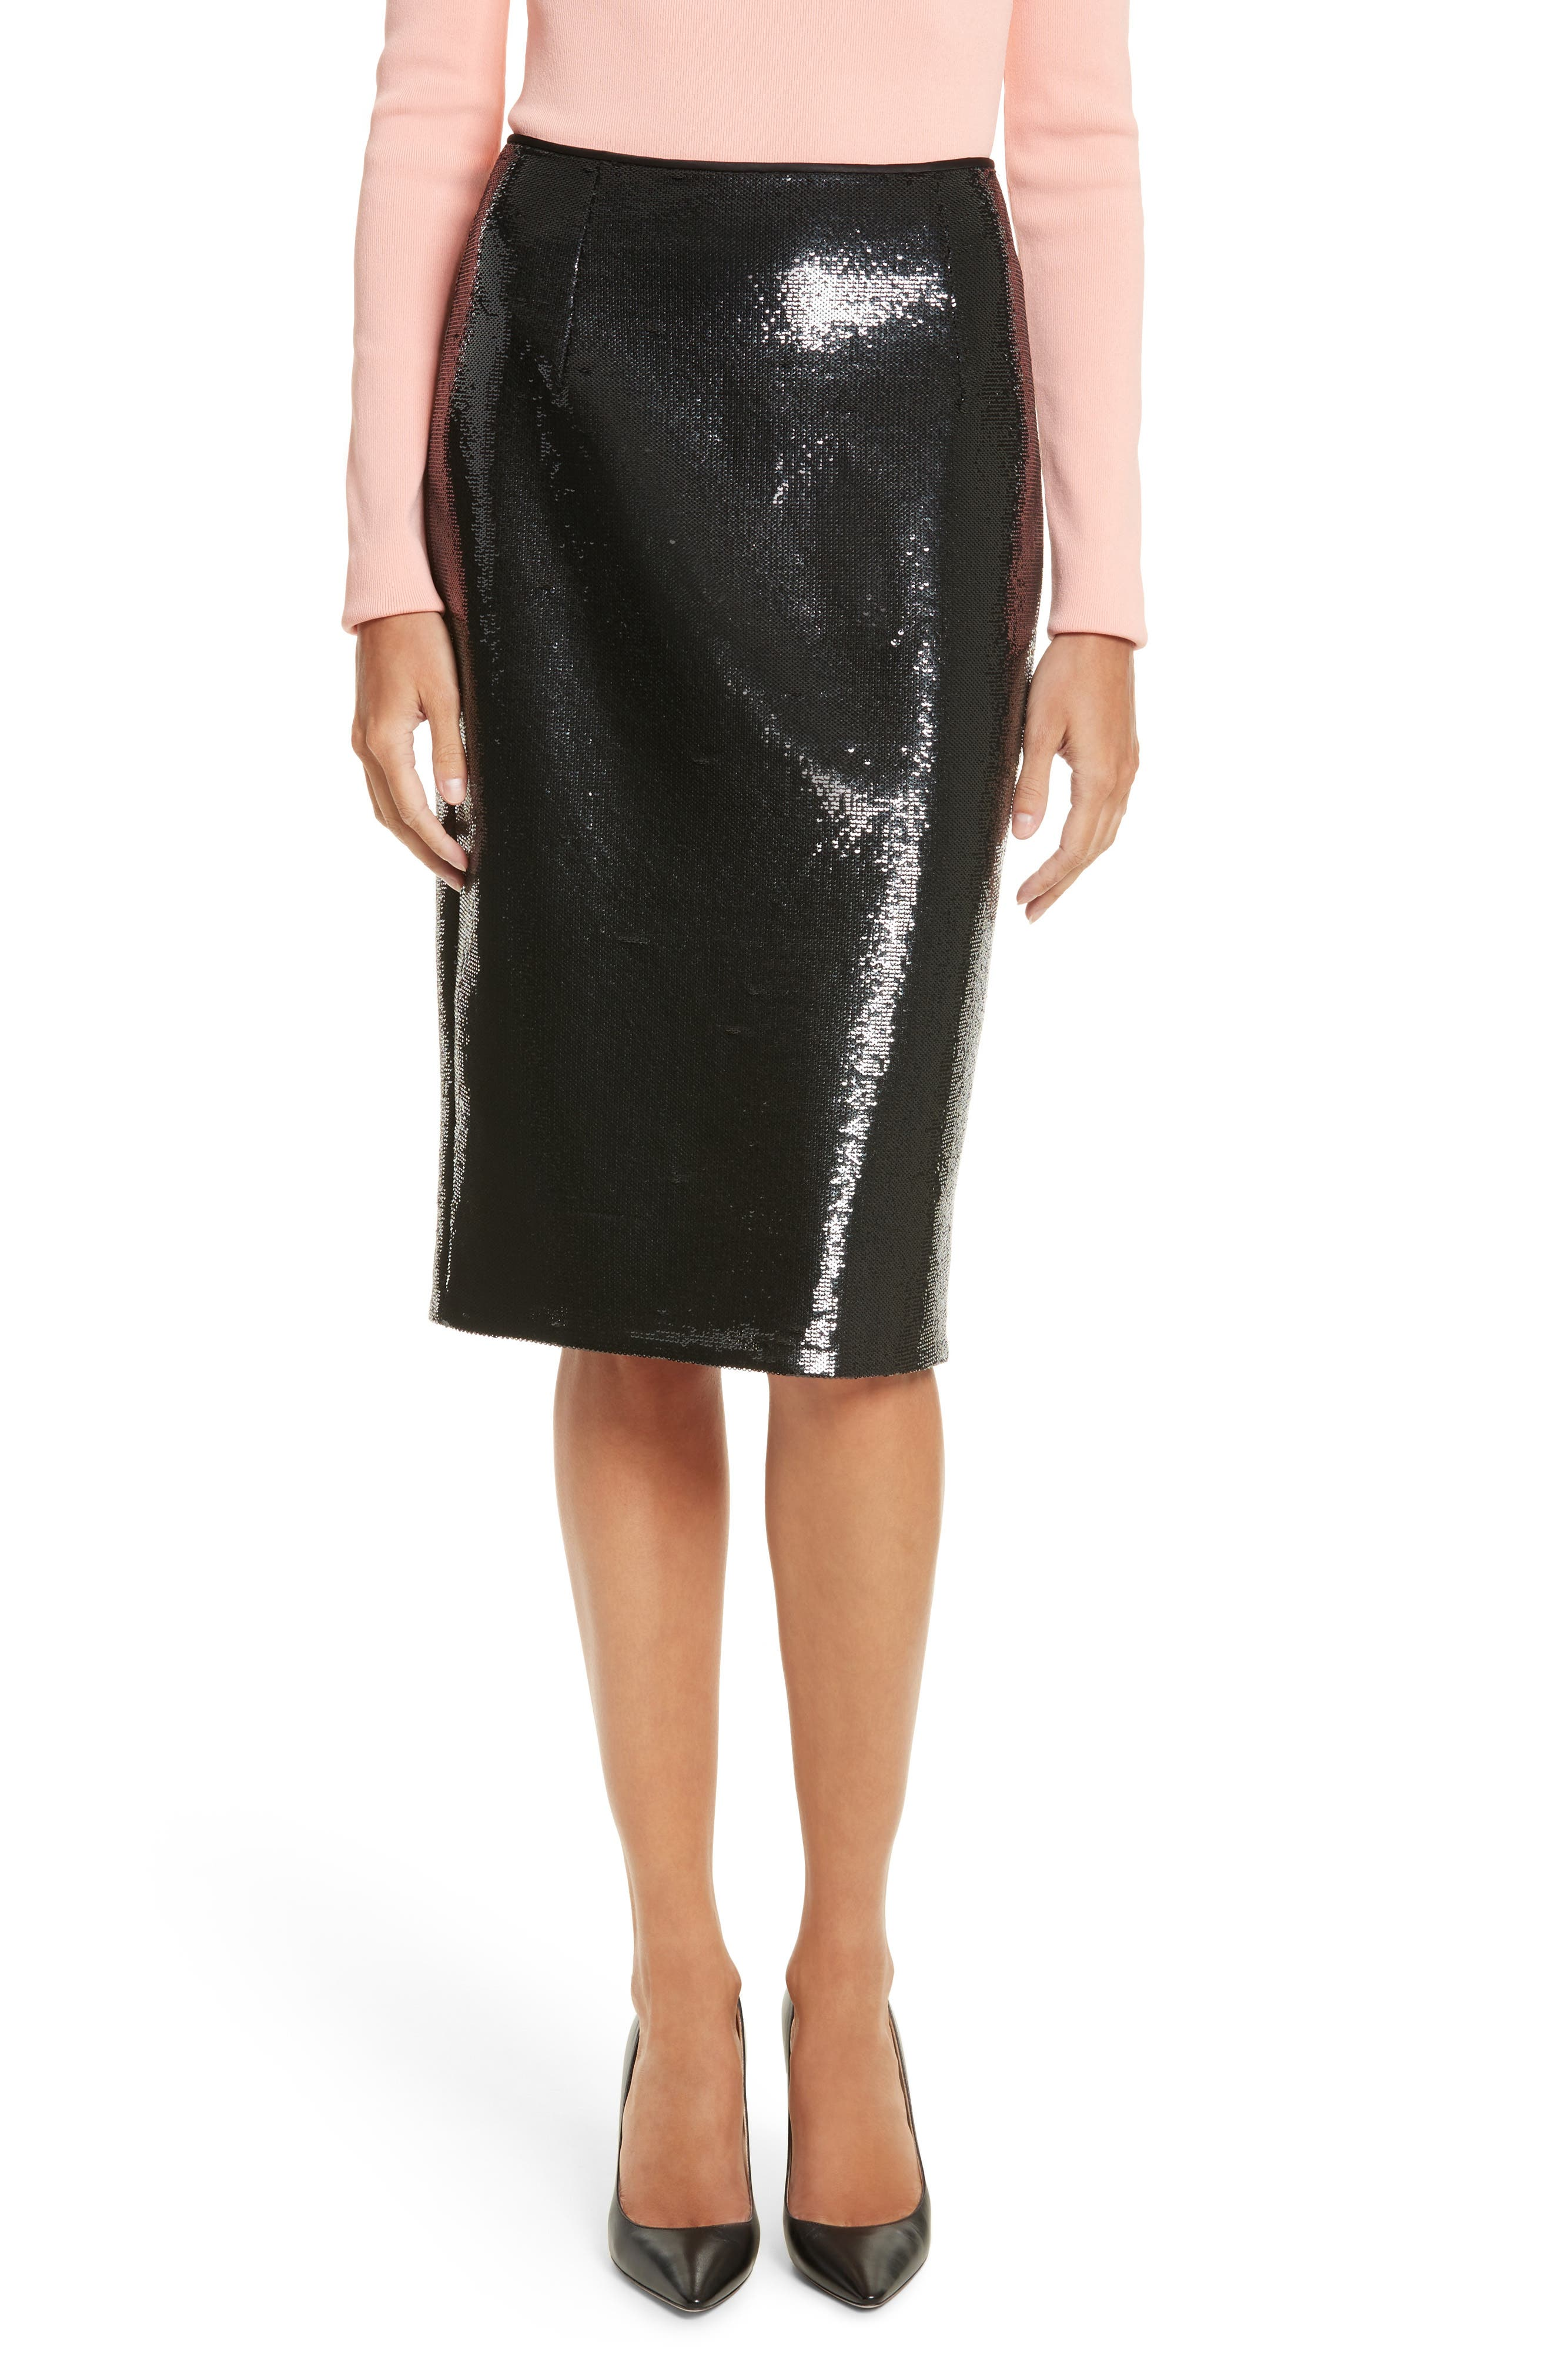 Diane von Furstenberg Sequin Pencil Skirt,                             Main thumbnail 1, color,                             001